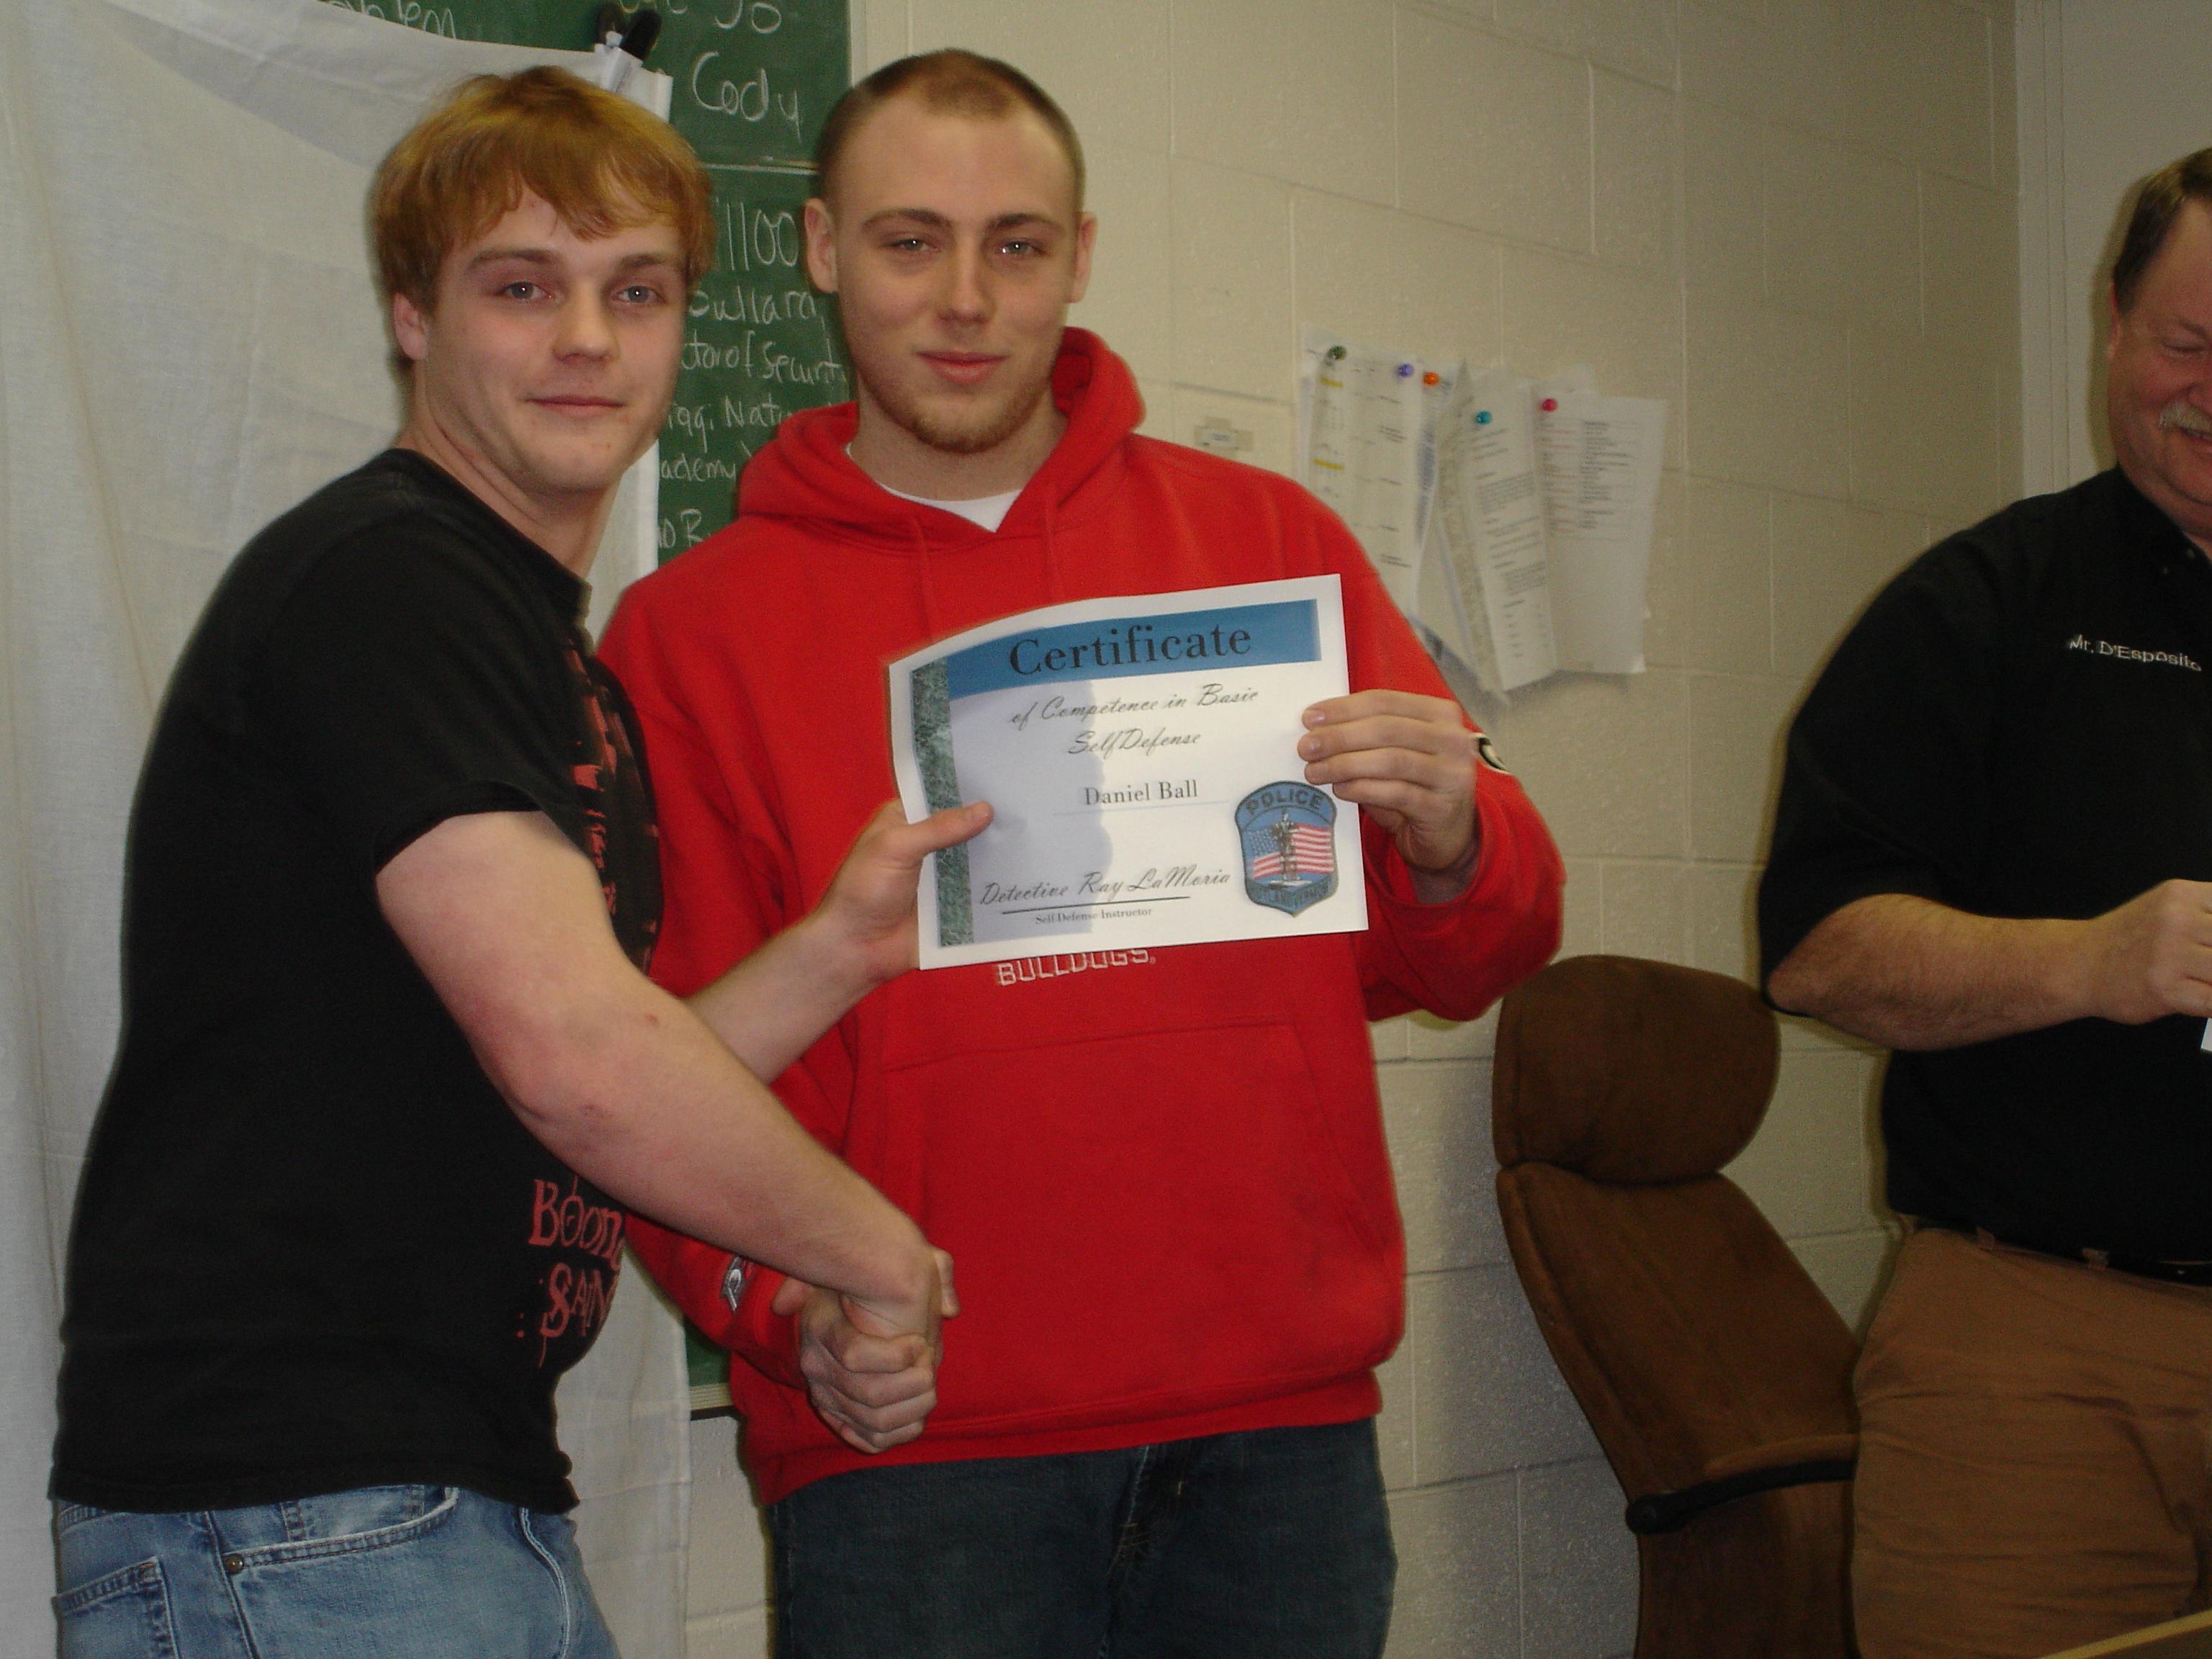 Cantlin Eaton receiving Haz-Mat Certificate